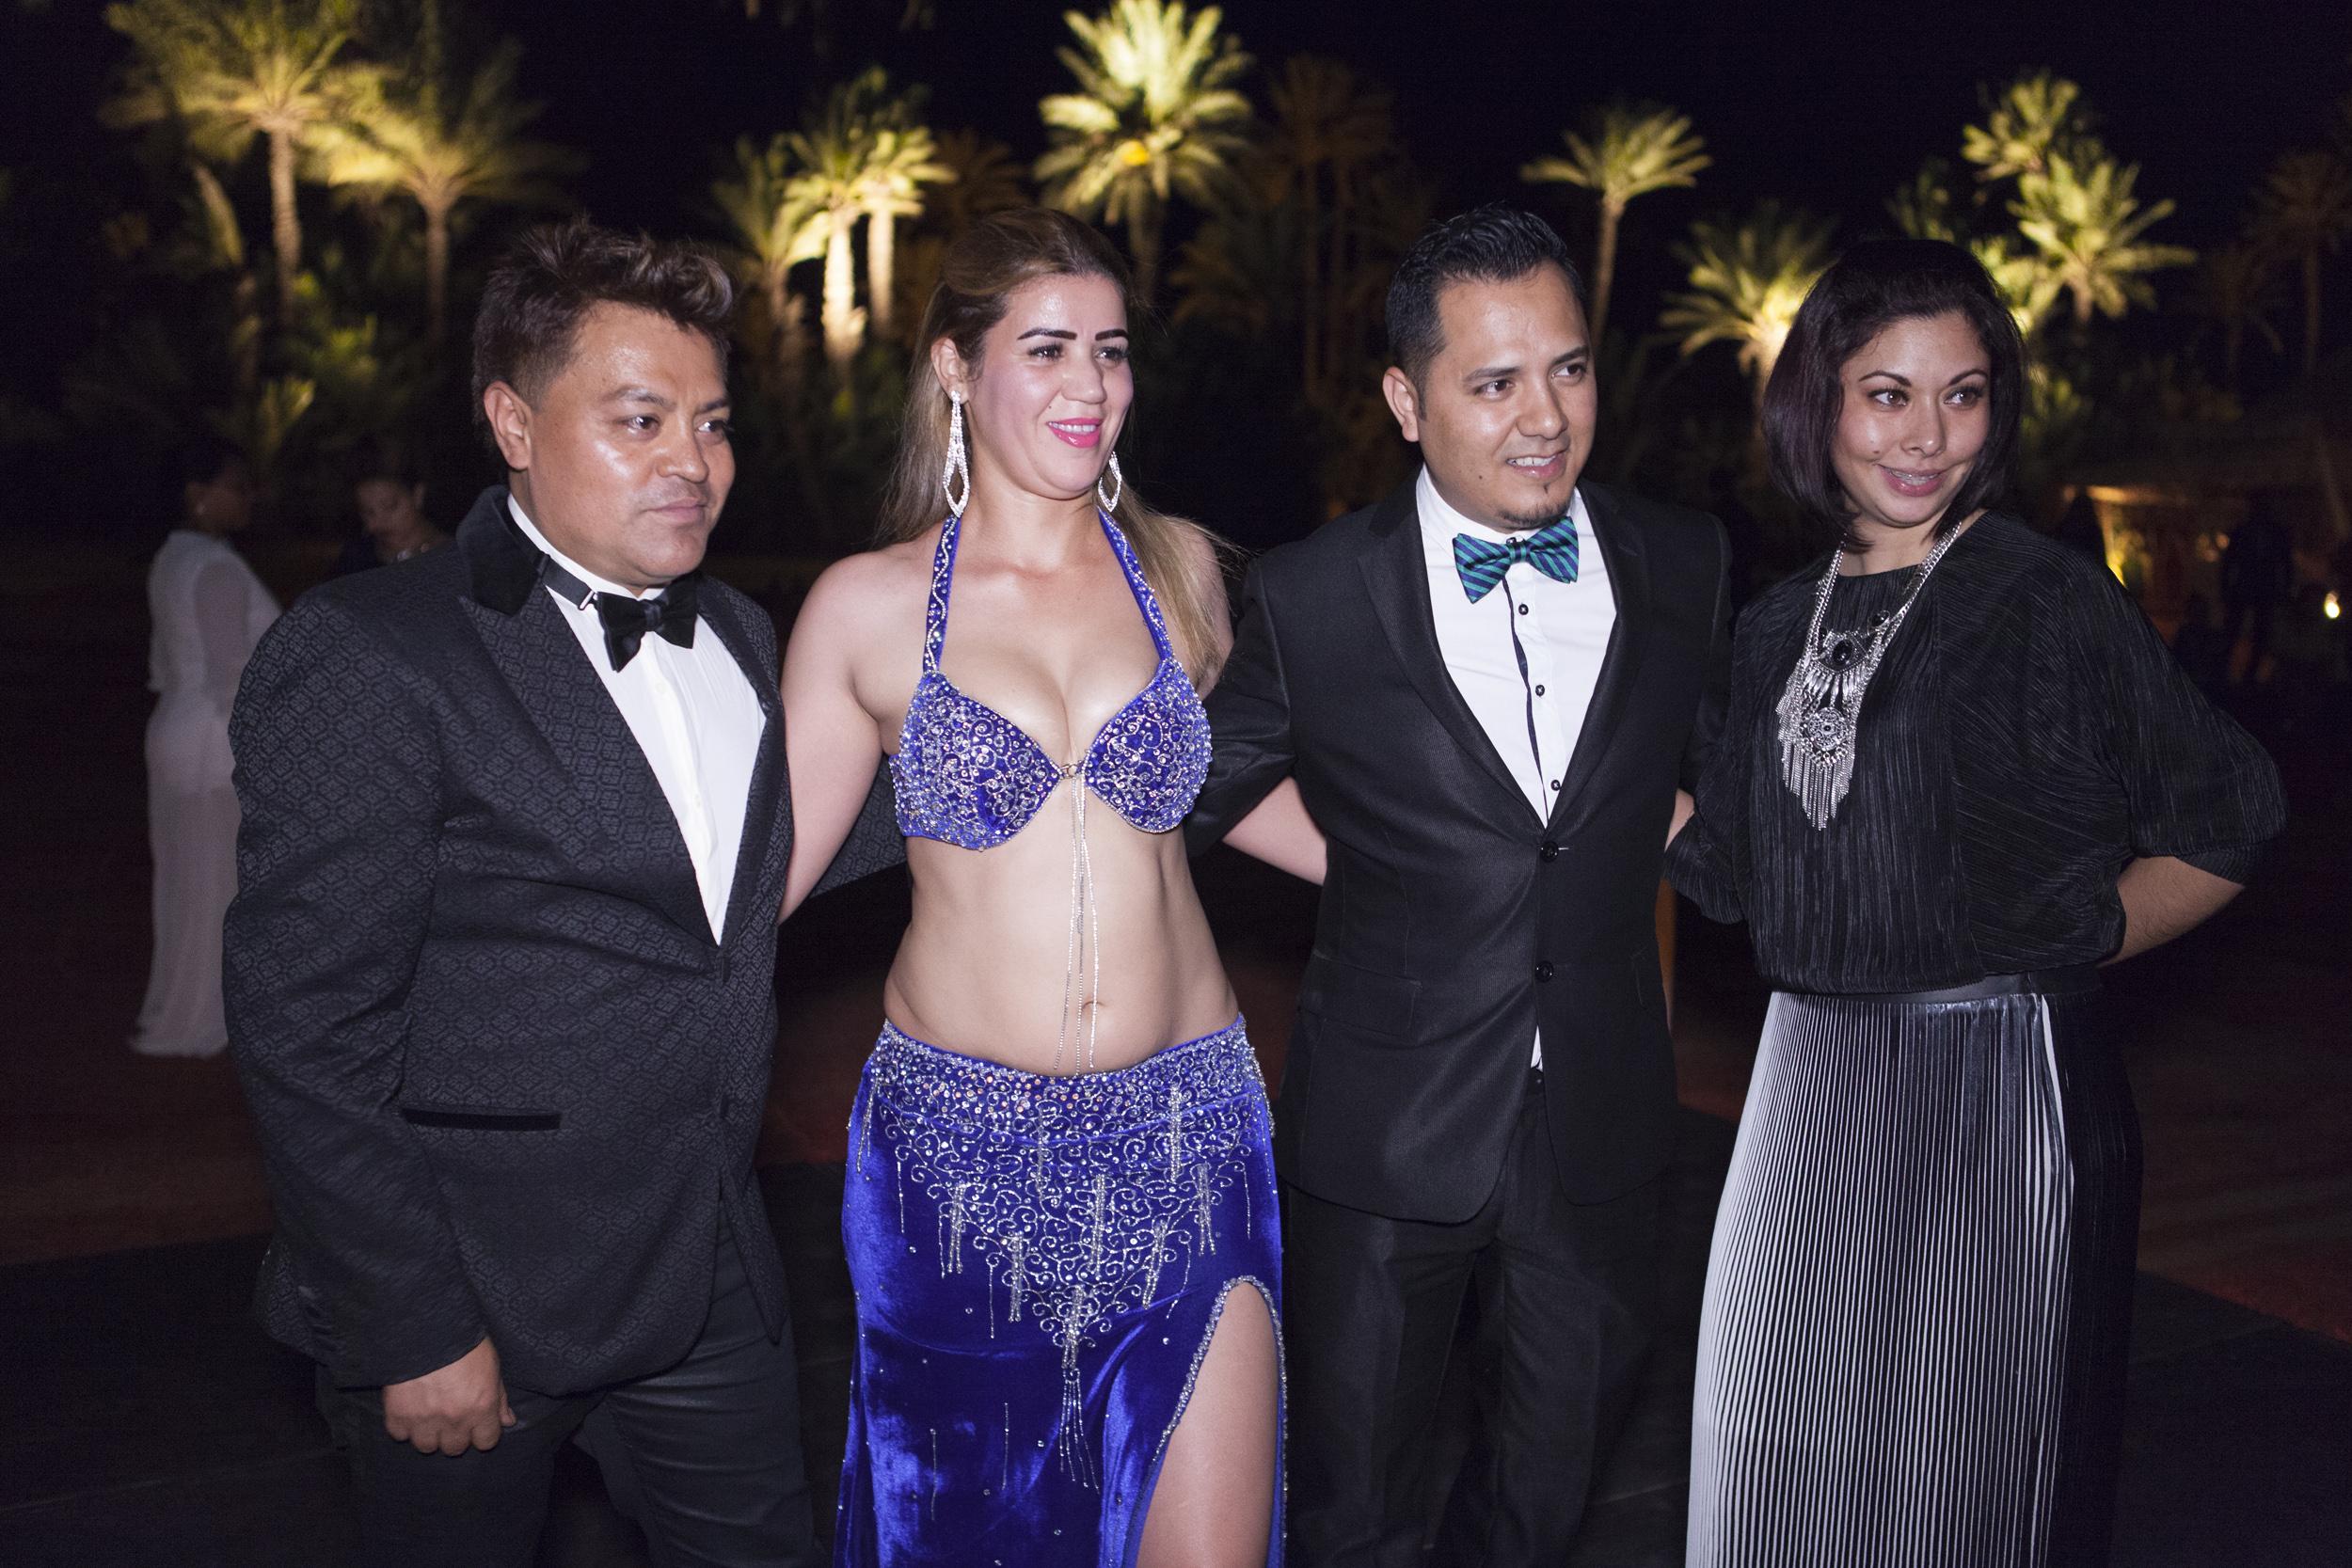 marrakech_cena_gala_convencion_anual_salerm_cosmetics_proline_107